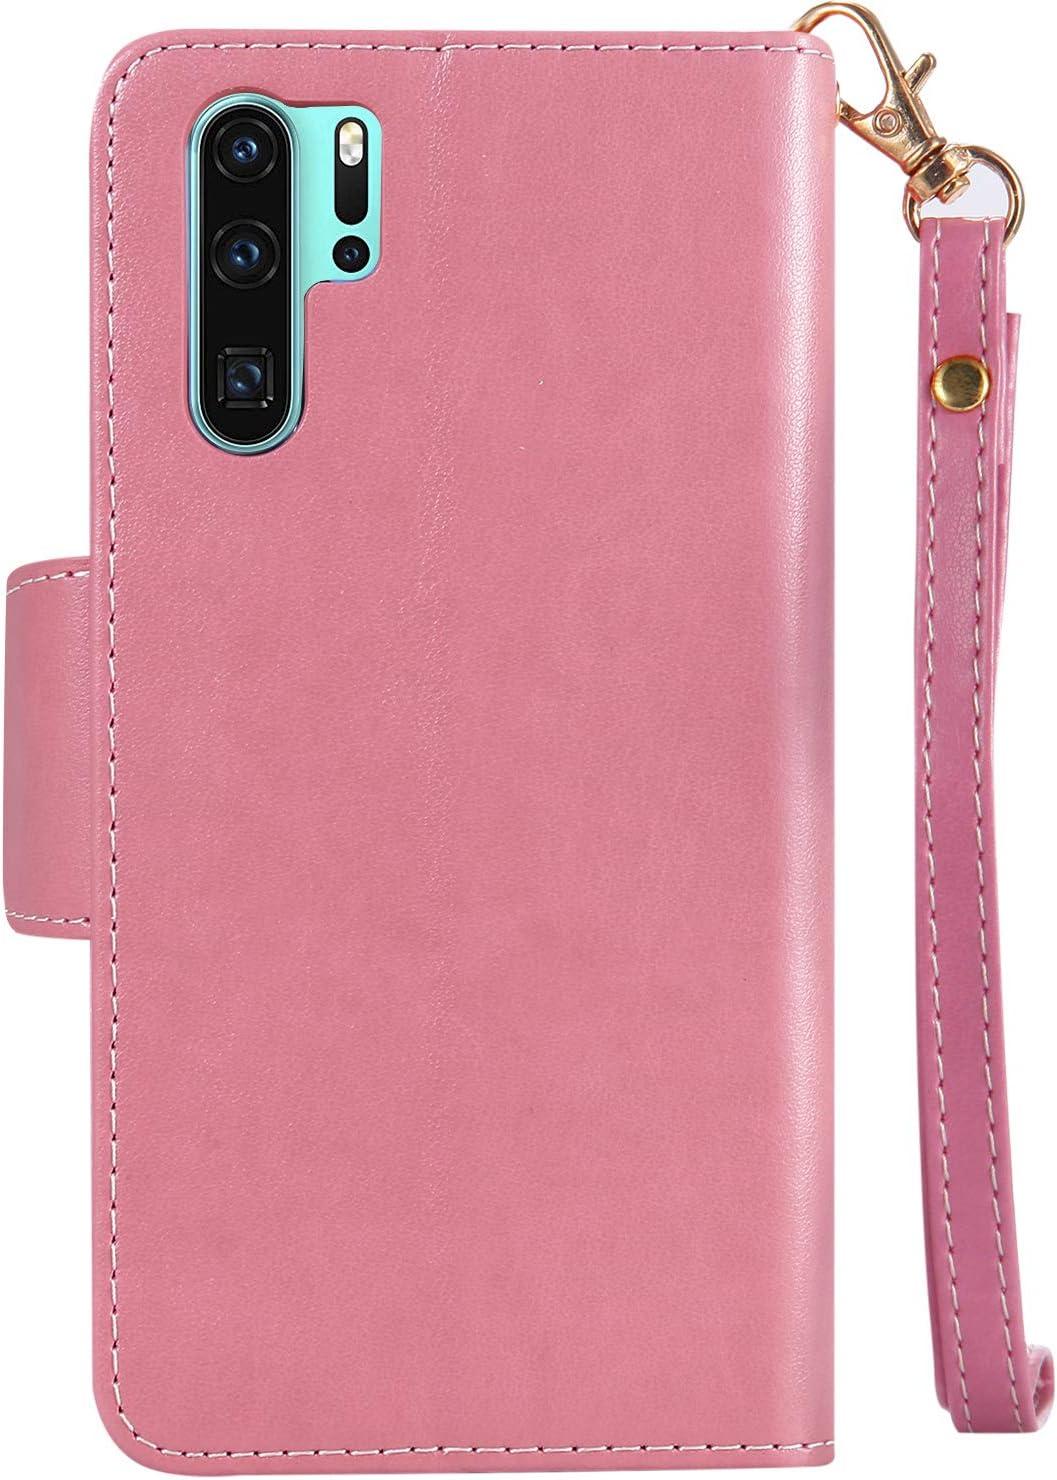 Felfy 9 Kartenf/ächer Kompatibel mit Huawei P30 Pro H/ülle,Kompatibel mit Huawei P30 Pro Case Magnetische Flip Cover PU Leder Handyh/ülle 3D M/ädchen Katze Muster Tasche Multifunktion Schutzh/ülle,Blau